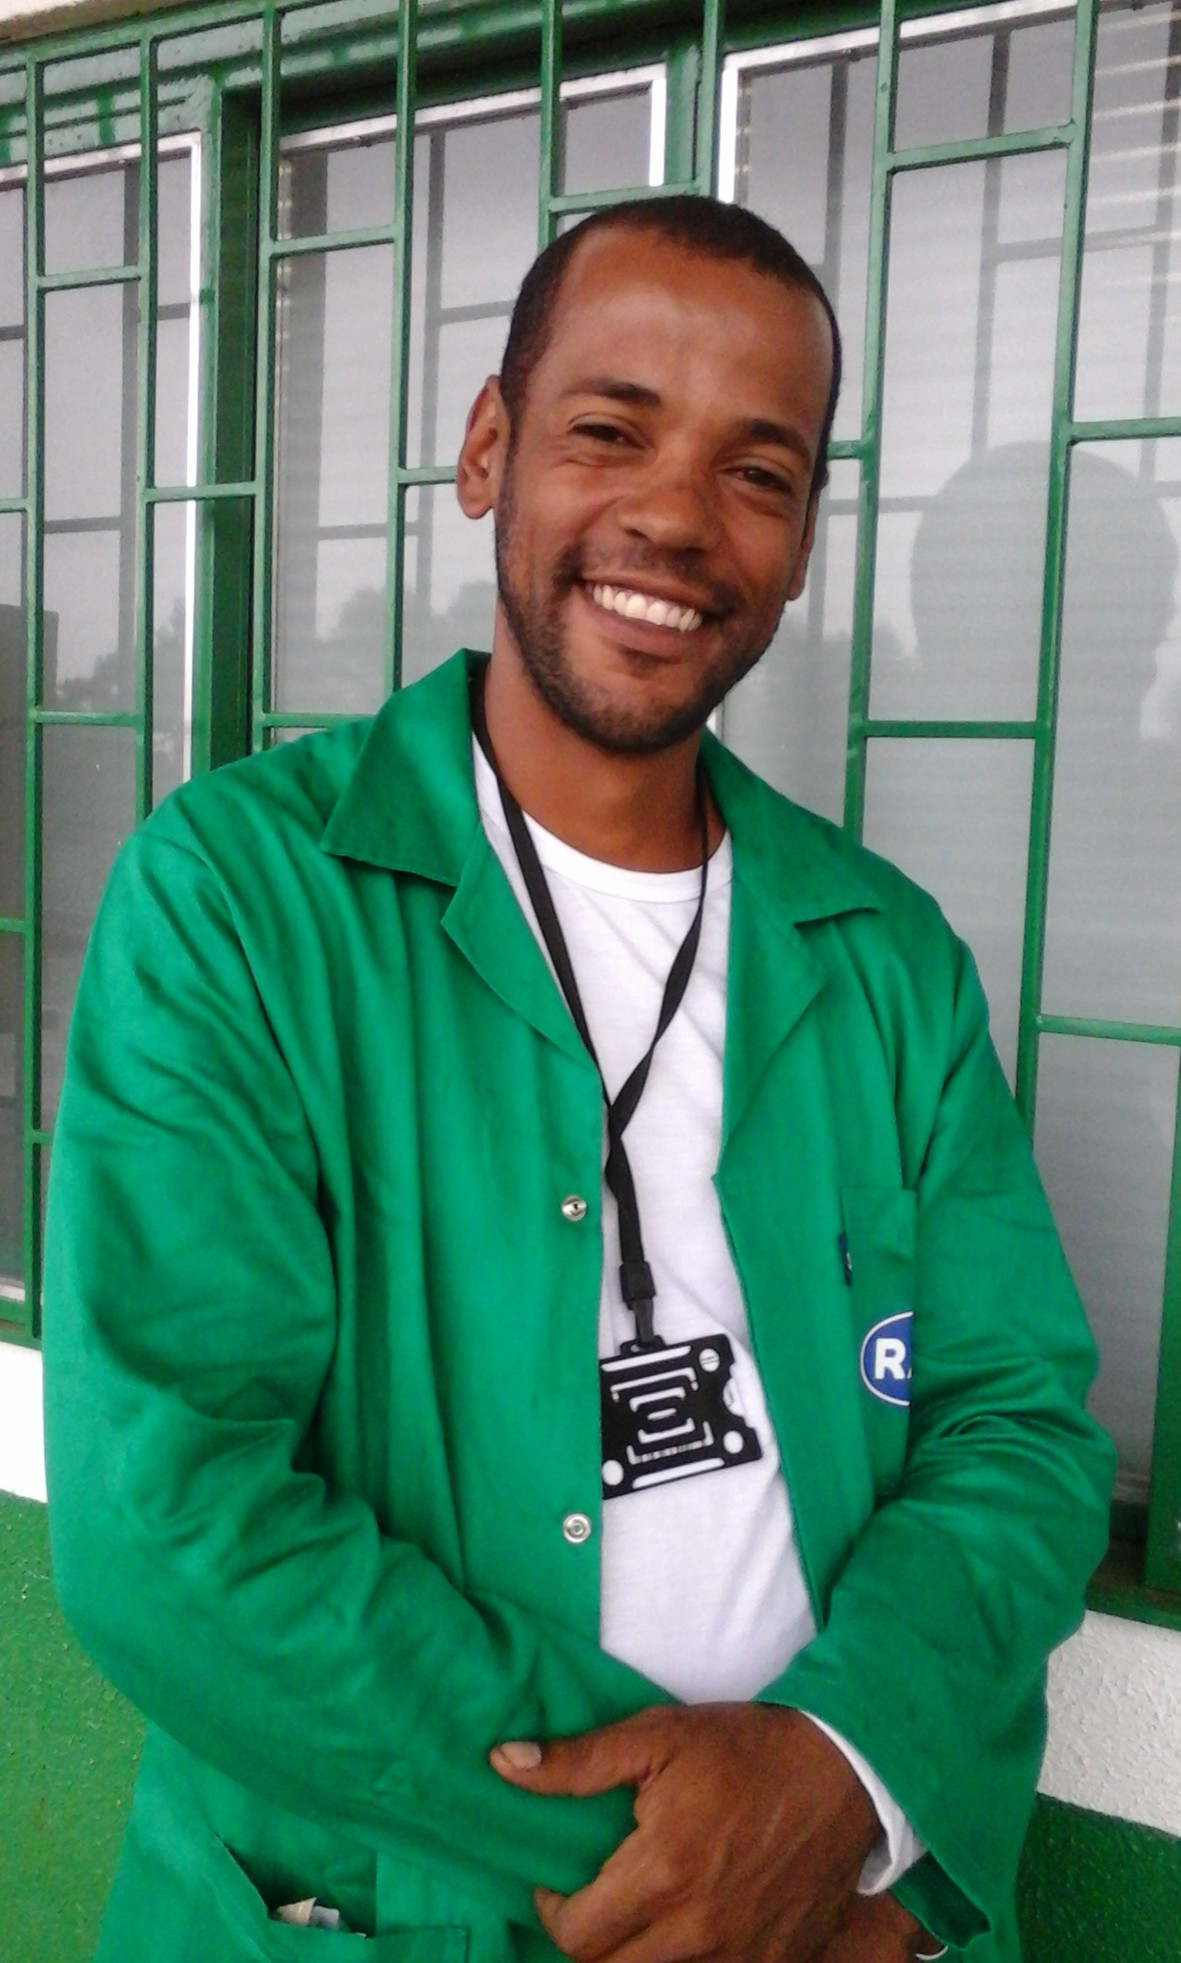 Neiriberto da Silva Alves, 30 anos